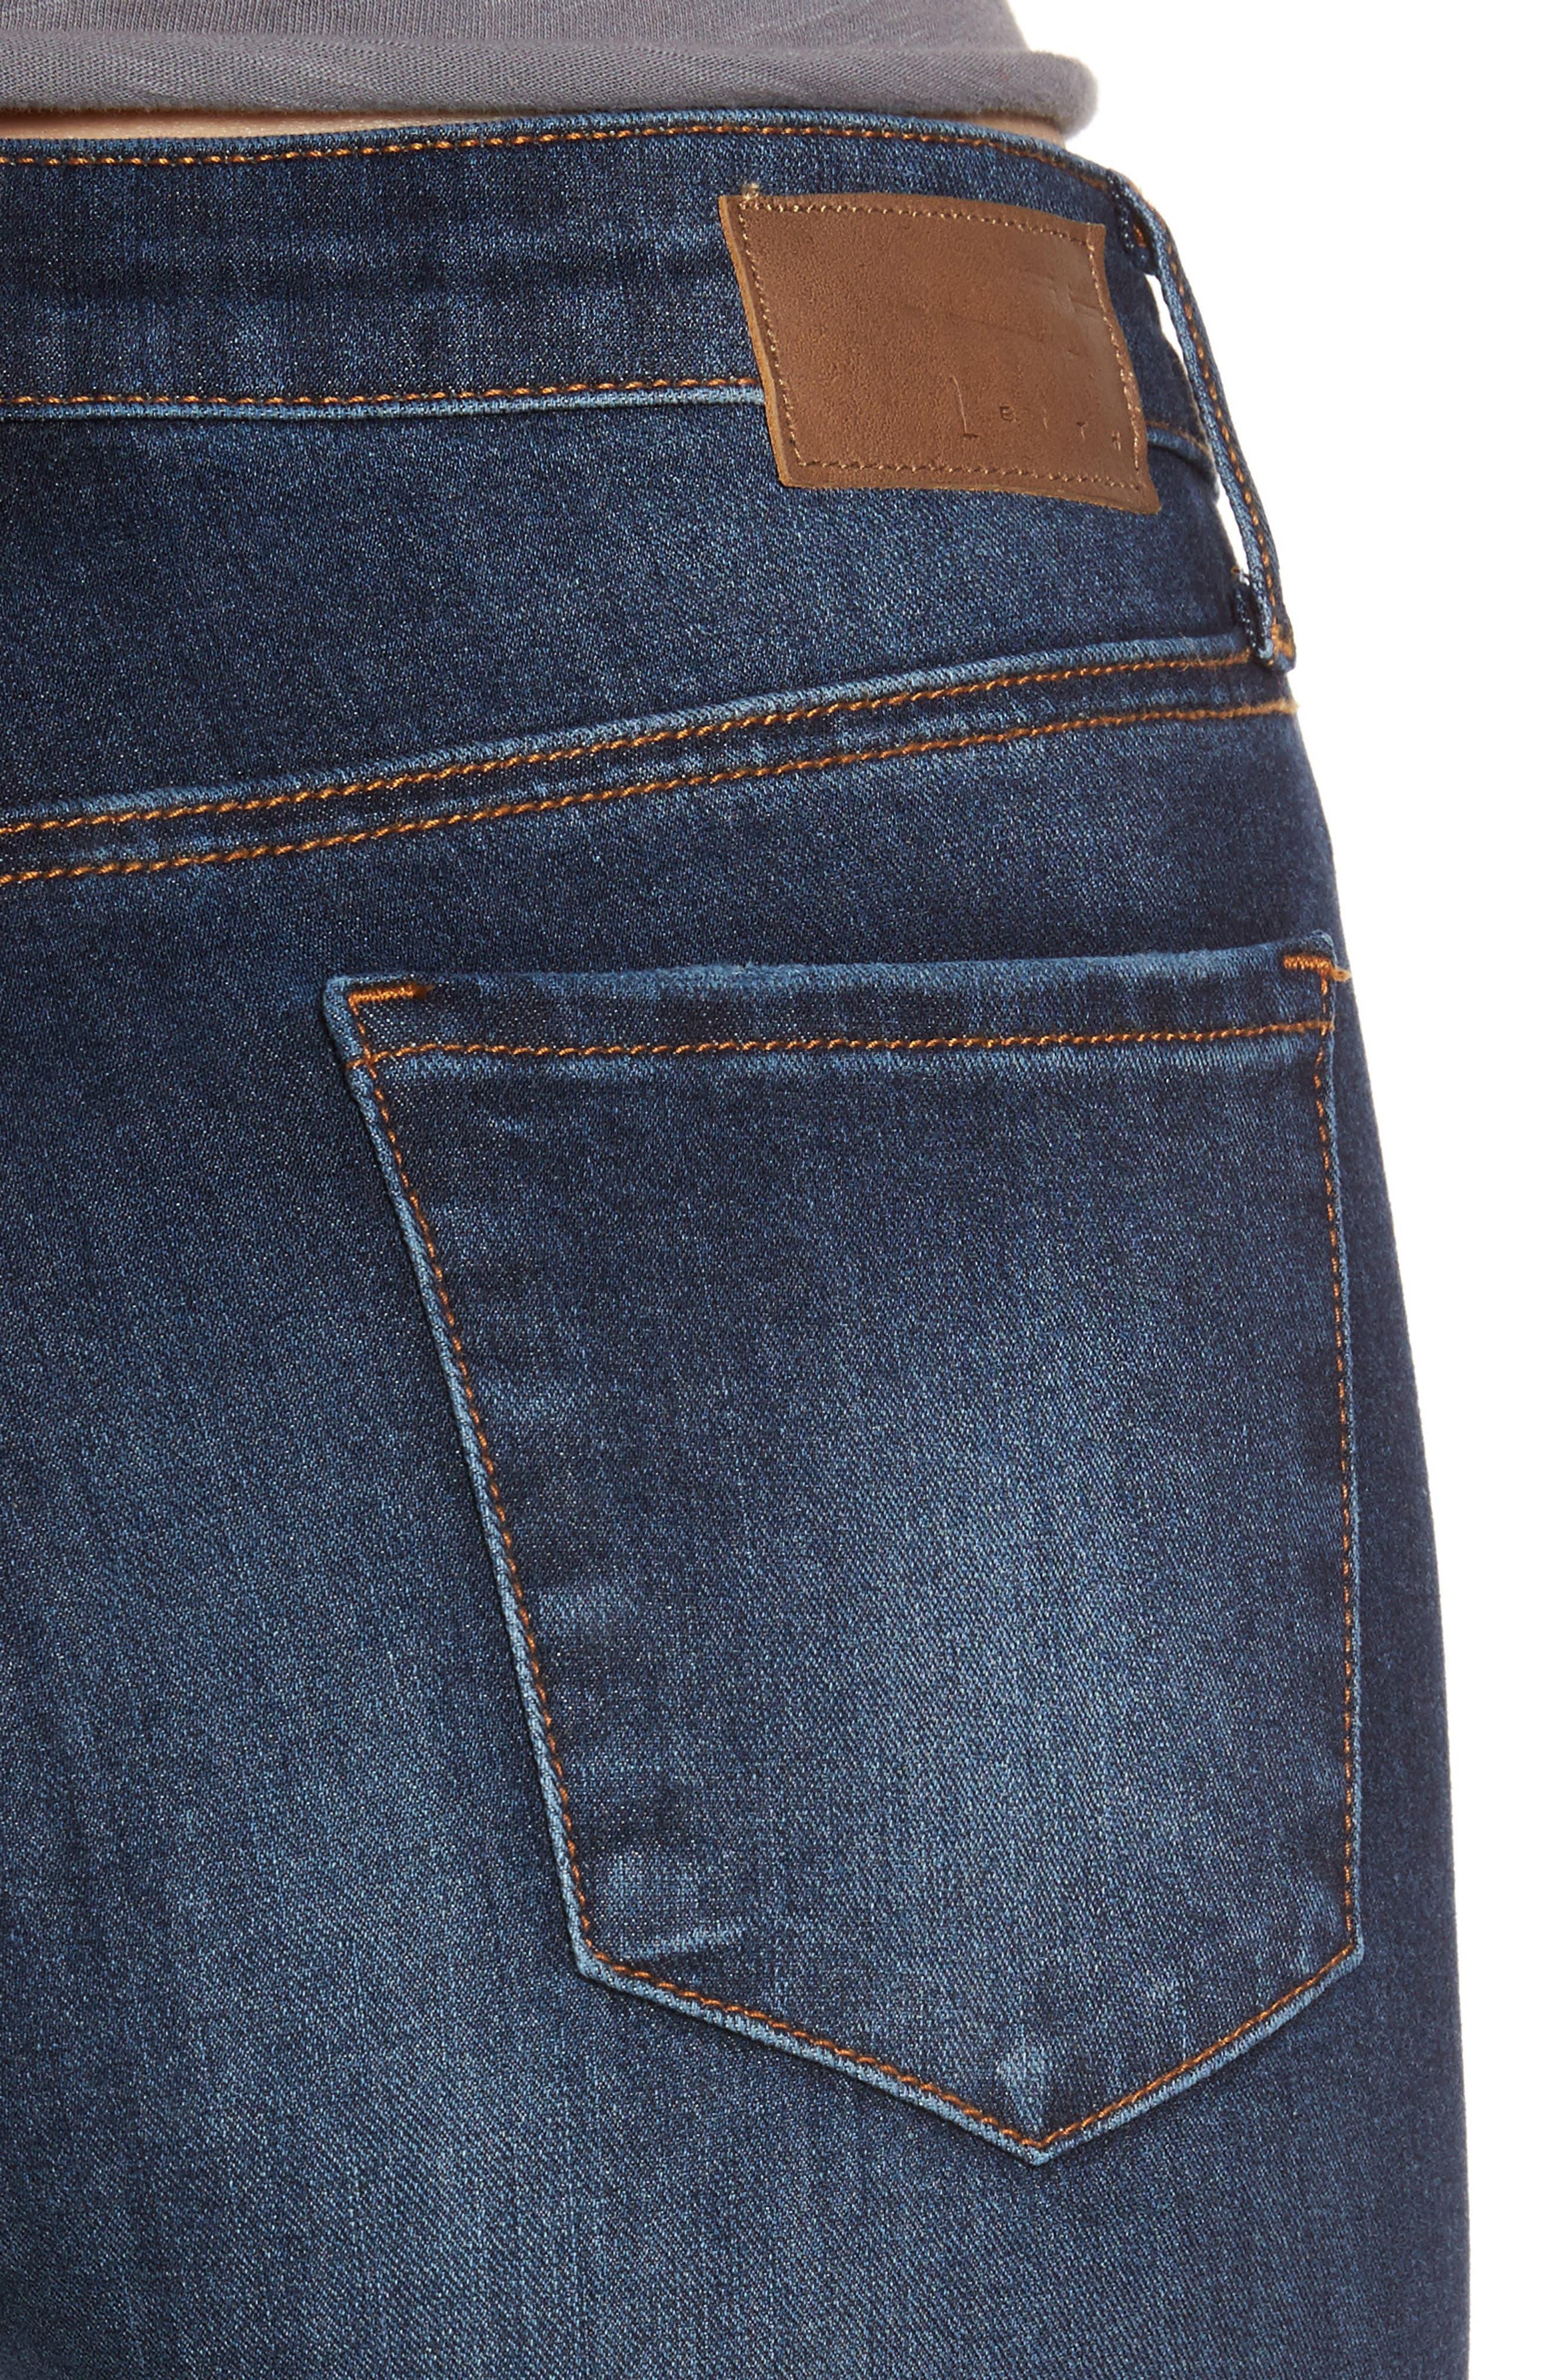 Alternate Image 4  - Leith Ripped Step Hem Skinny Jeans (Destroy Medium)